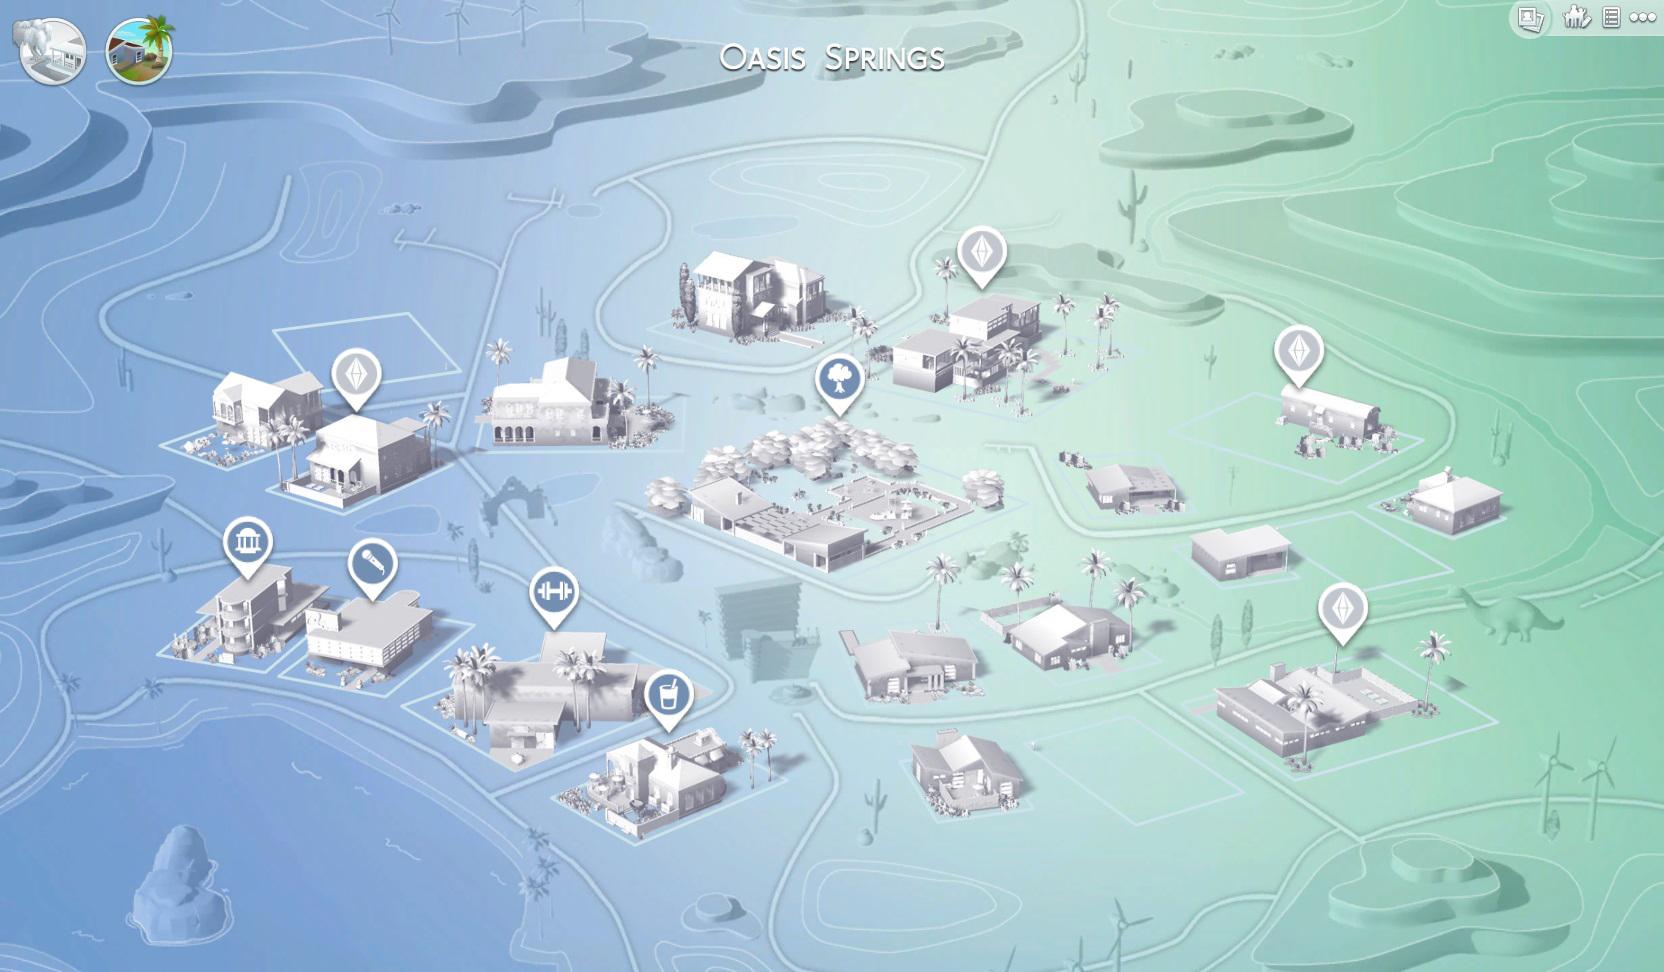 Sims 4 Jeu De Base Oasis Springs Parthenia Lost In Ze Sims